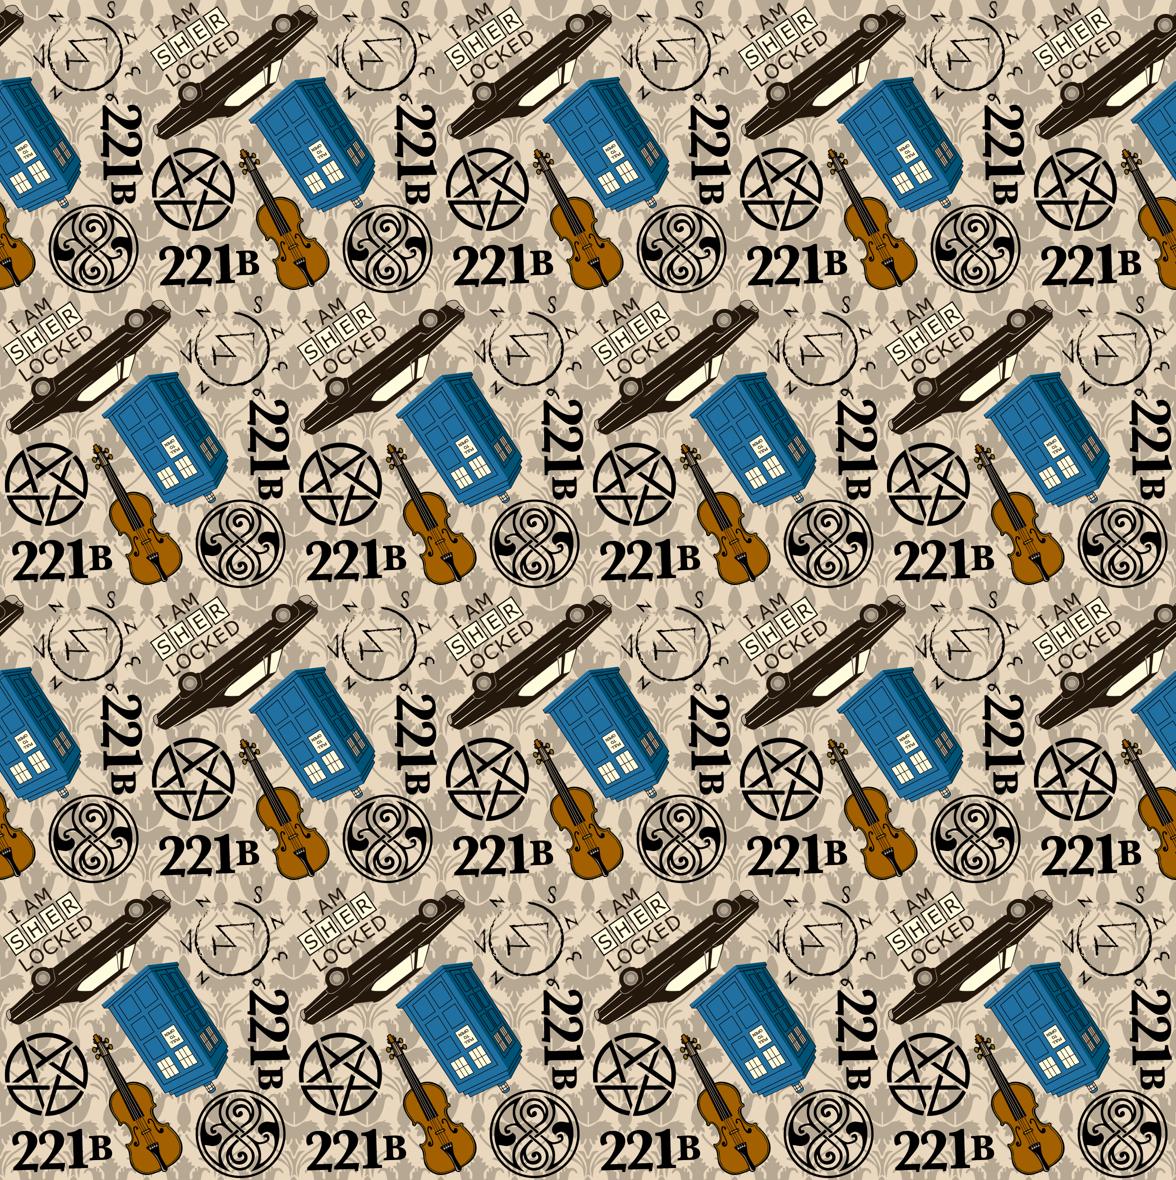 superwholock desktop wallpaper - photo #17